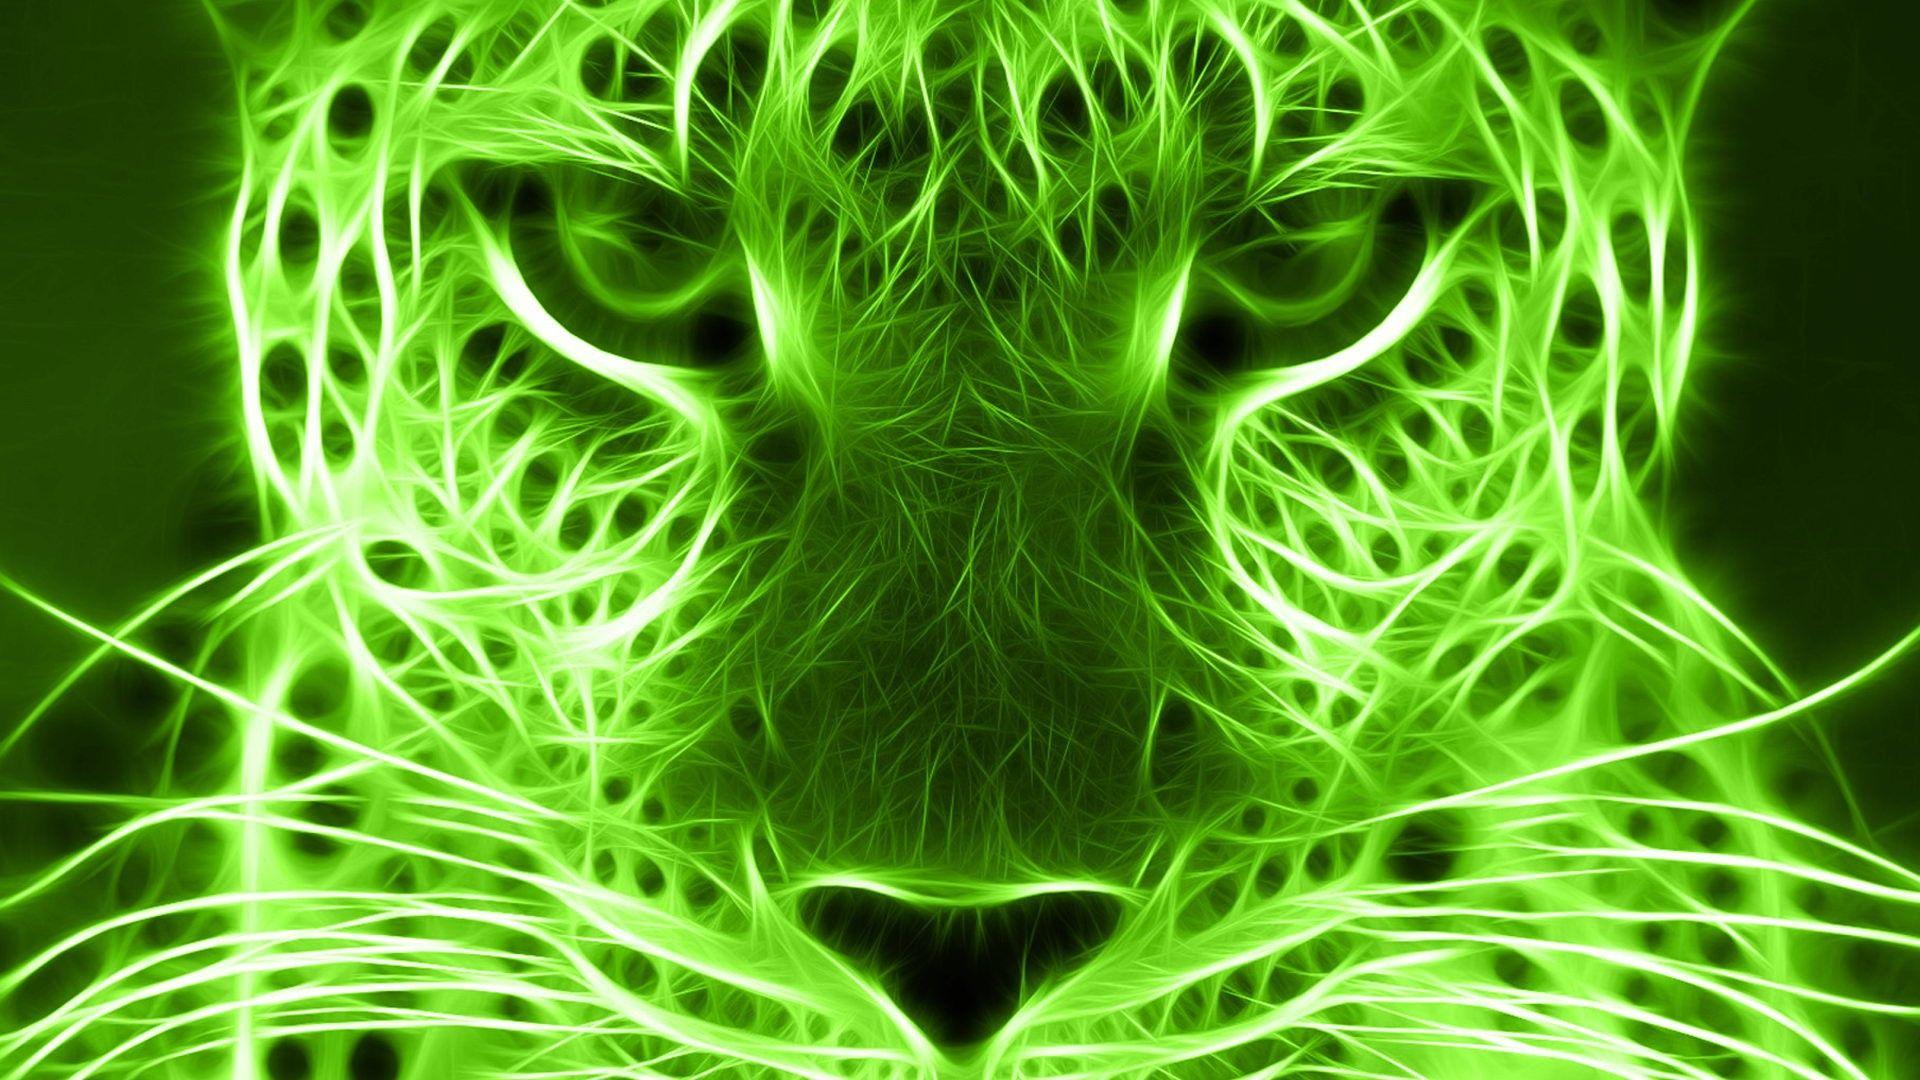 Neon Green Desktop Wallpaper Best Wallpaper Hd Lime Green Wallpaper Green Pictures Green Animals